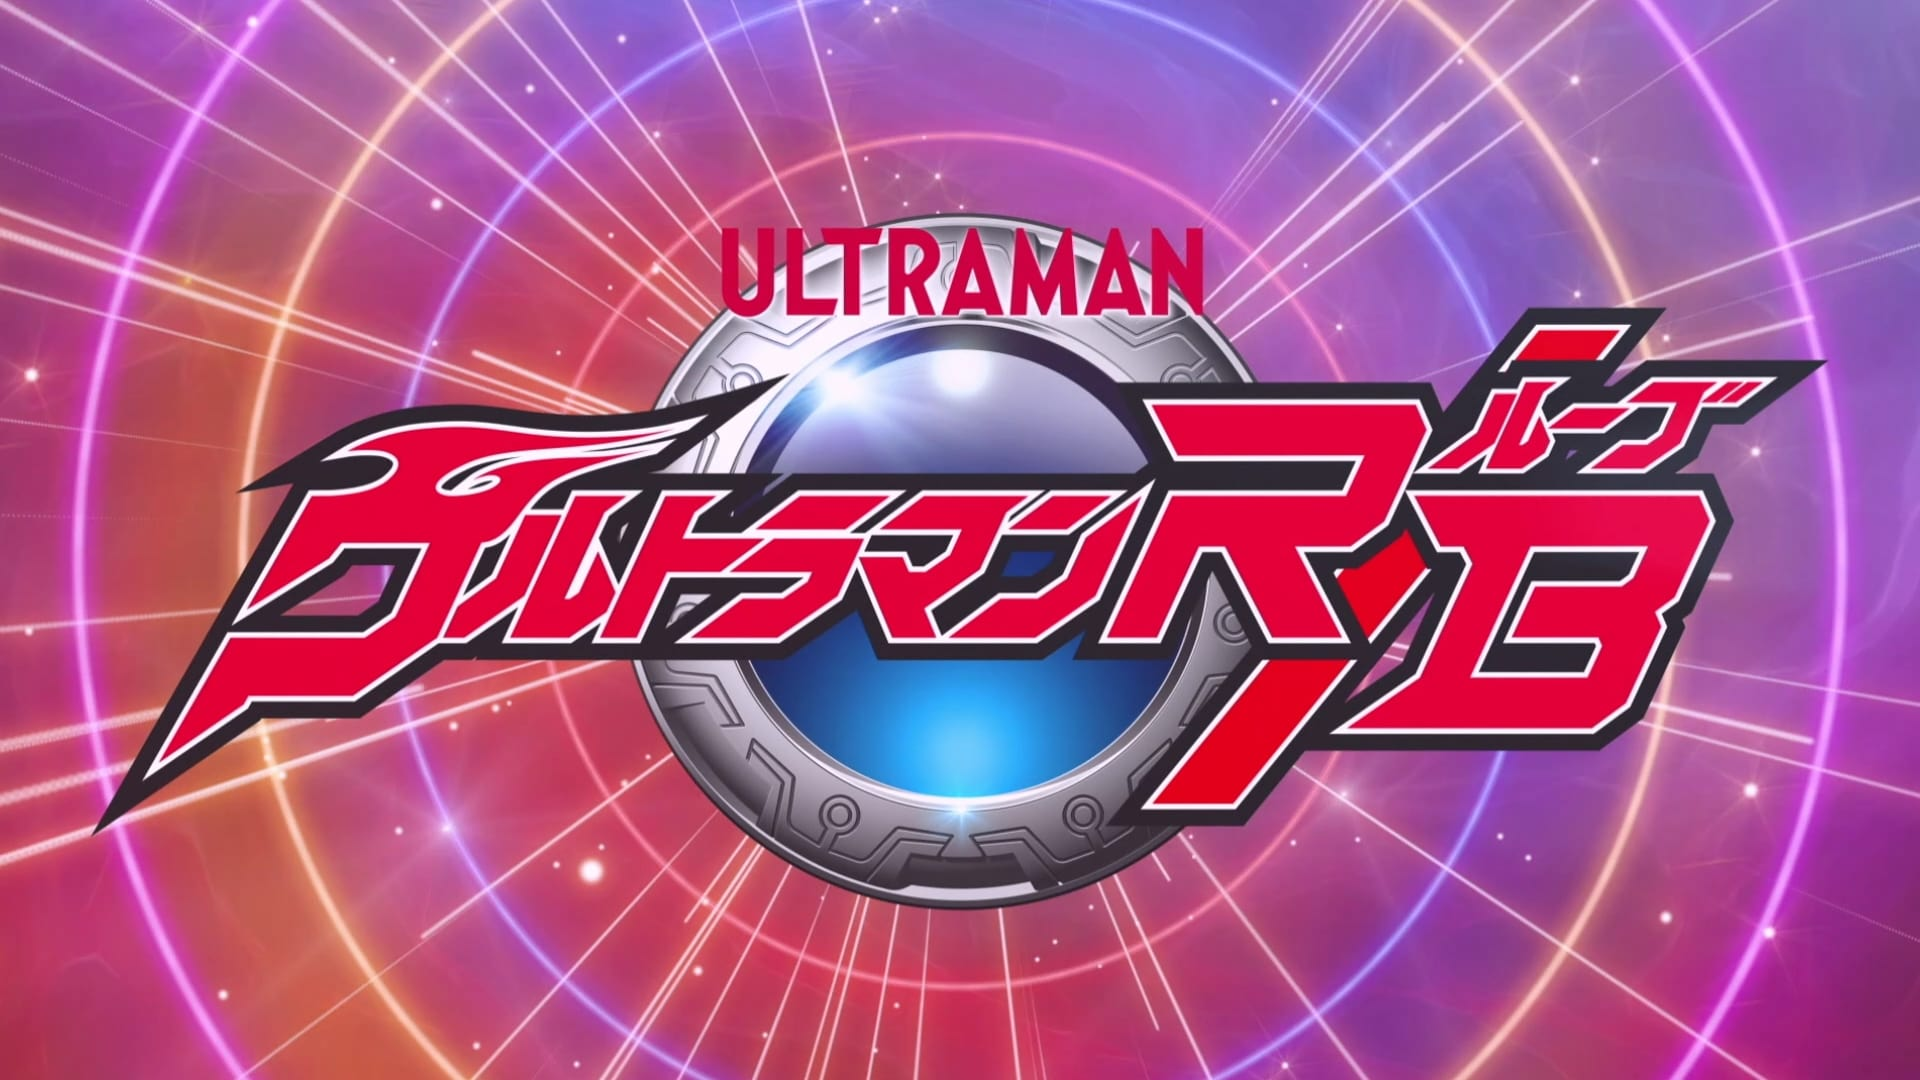 Watch free Ultraman R/B 翻訳者 مترجم movies and TV shows